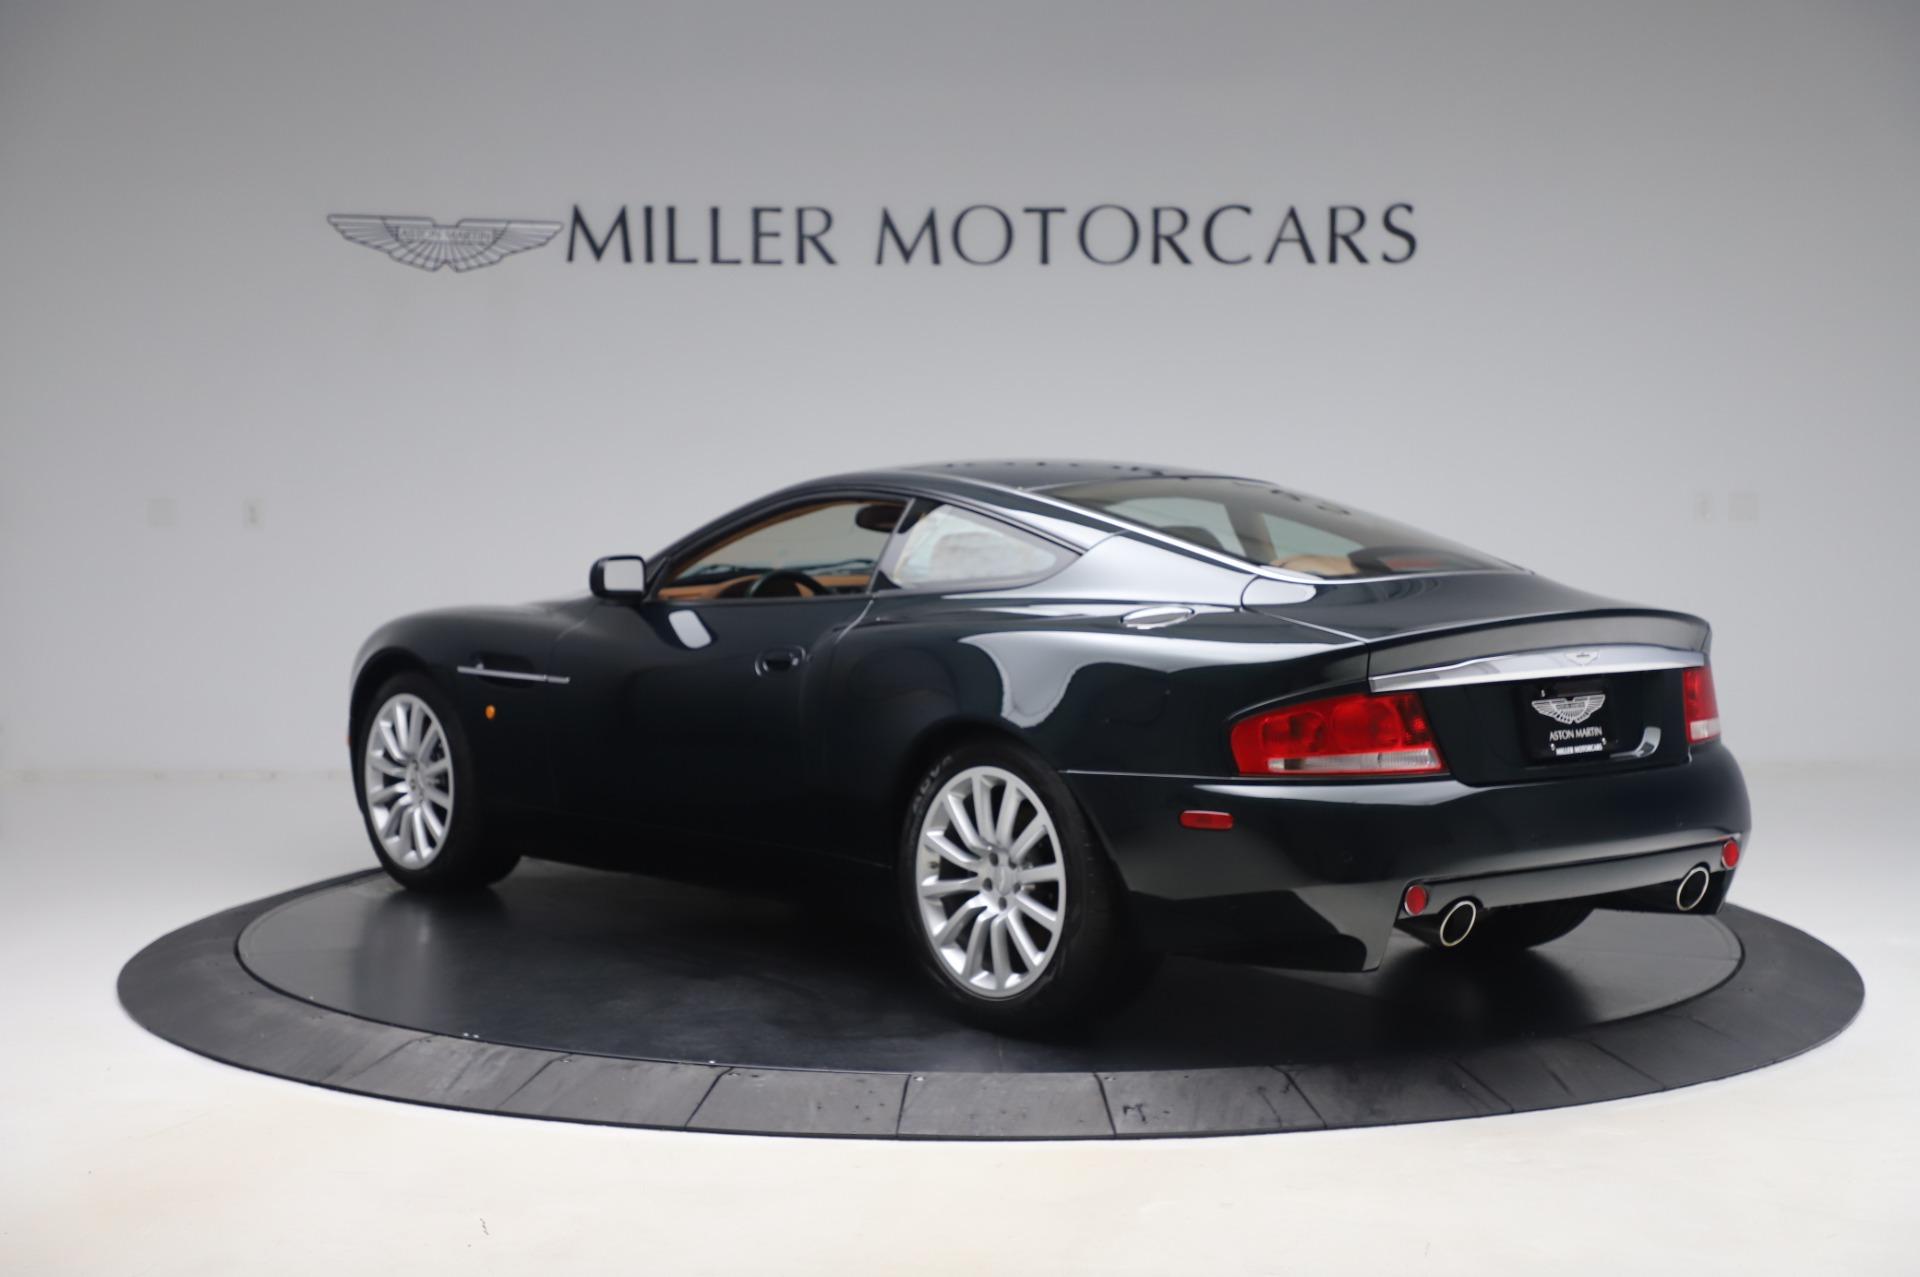 Used-2003-Aston-Martin-V12-Vanquish-Coupe